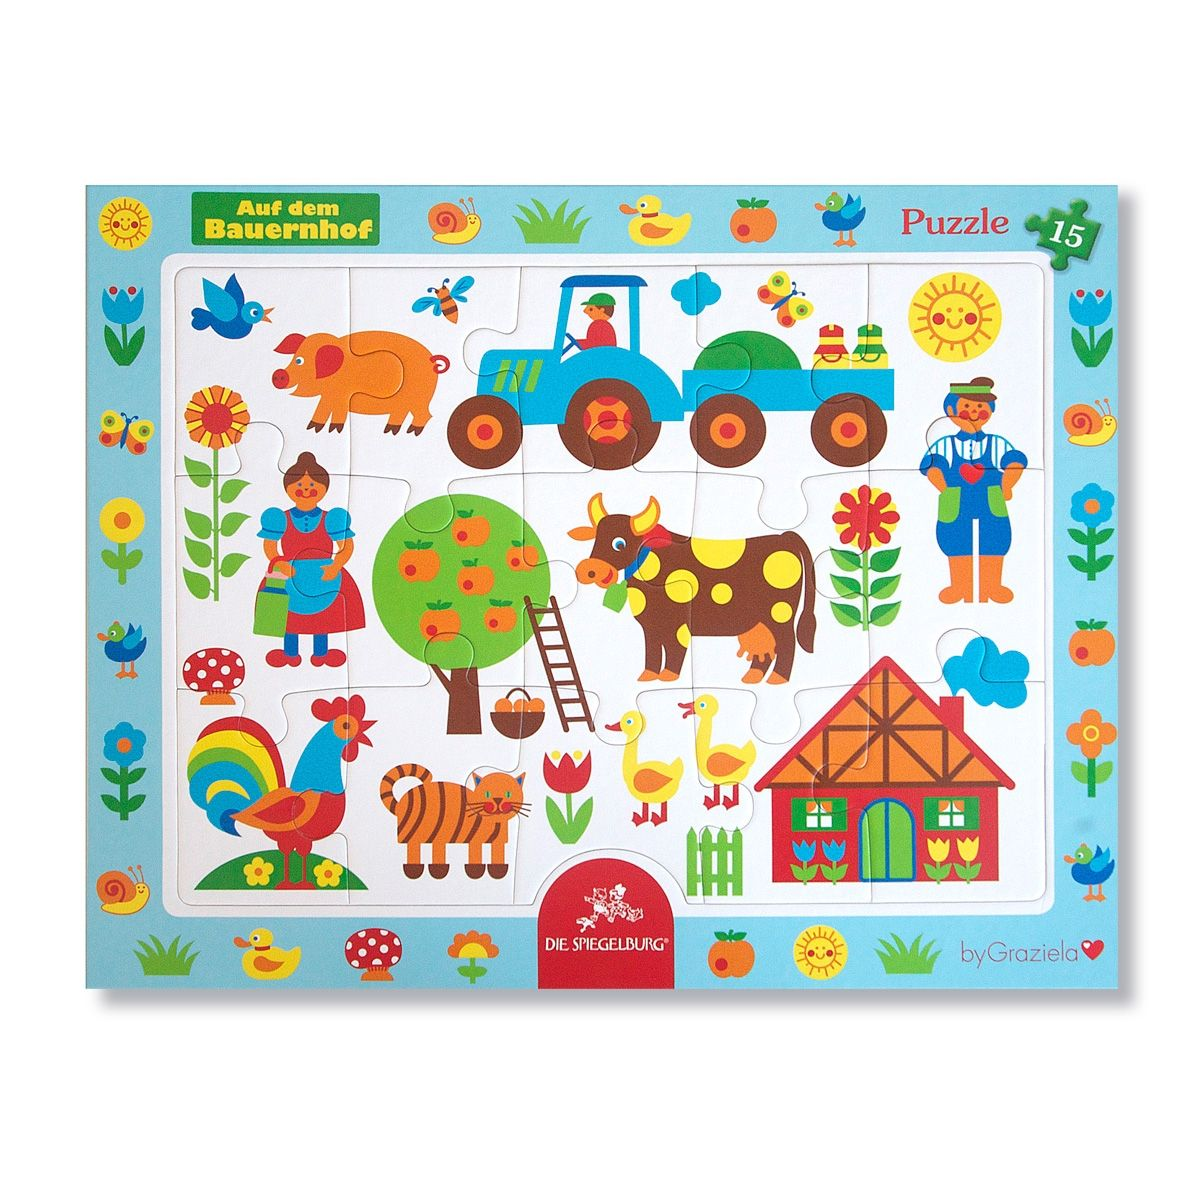 "Bauernhof Rahmenpuzzle / Puzzle ""on the farm"". This perfect little gift makes everyone happy!"